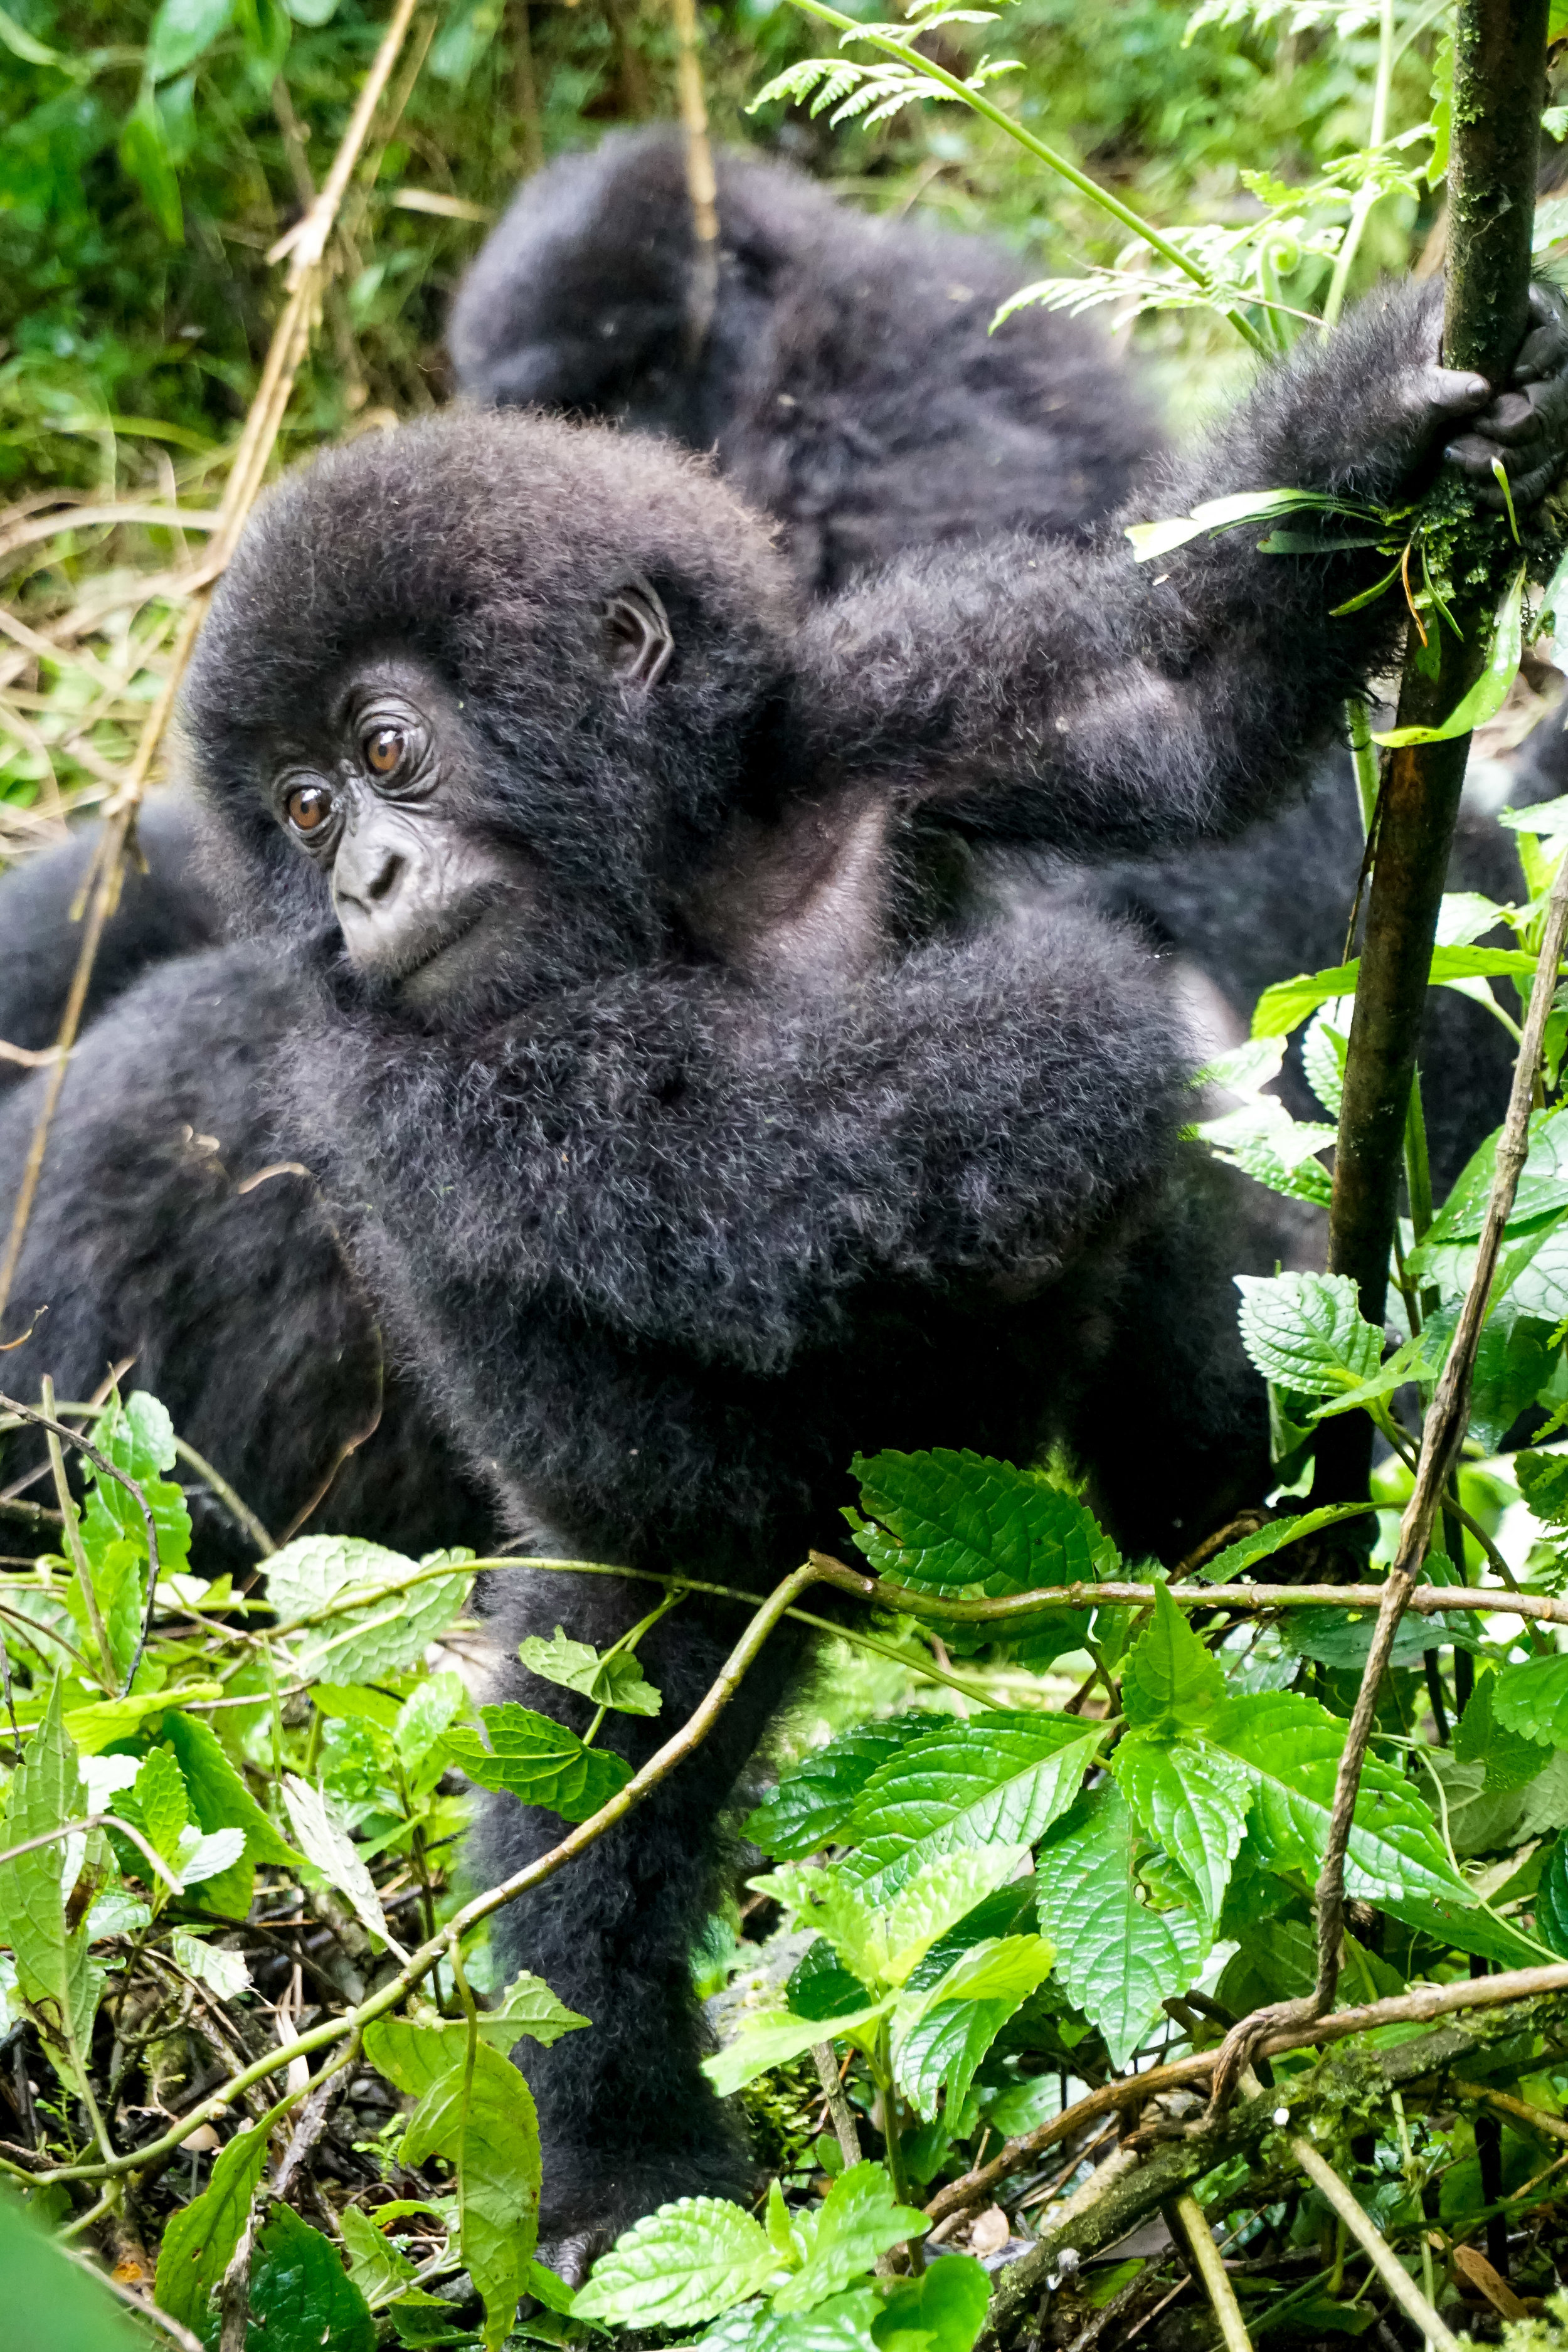 curio.trips.rwanda.baby.gorilla.profile.potrait.jpg